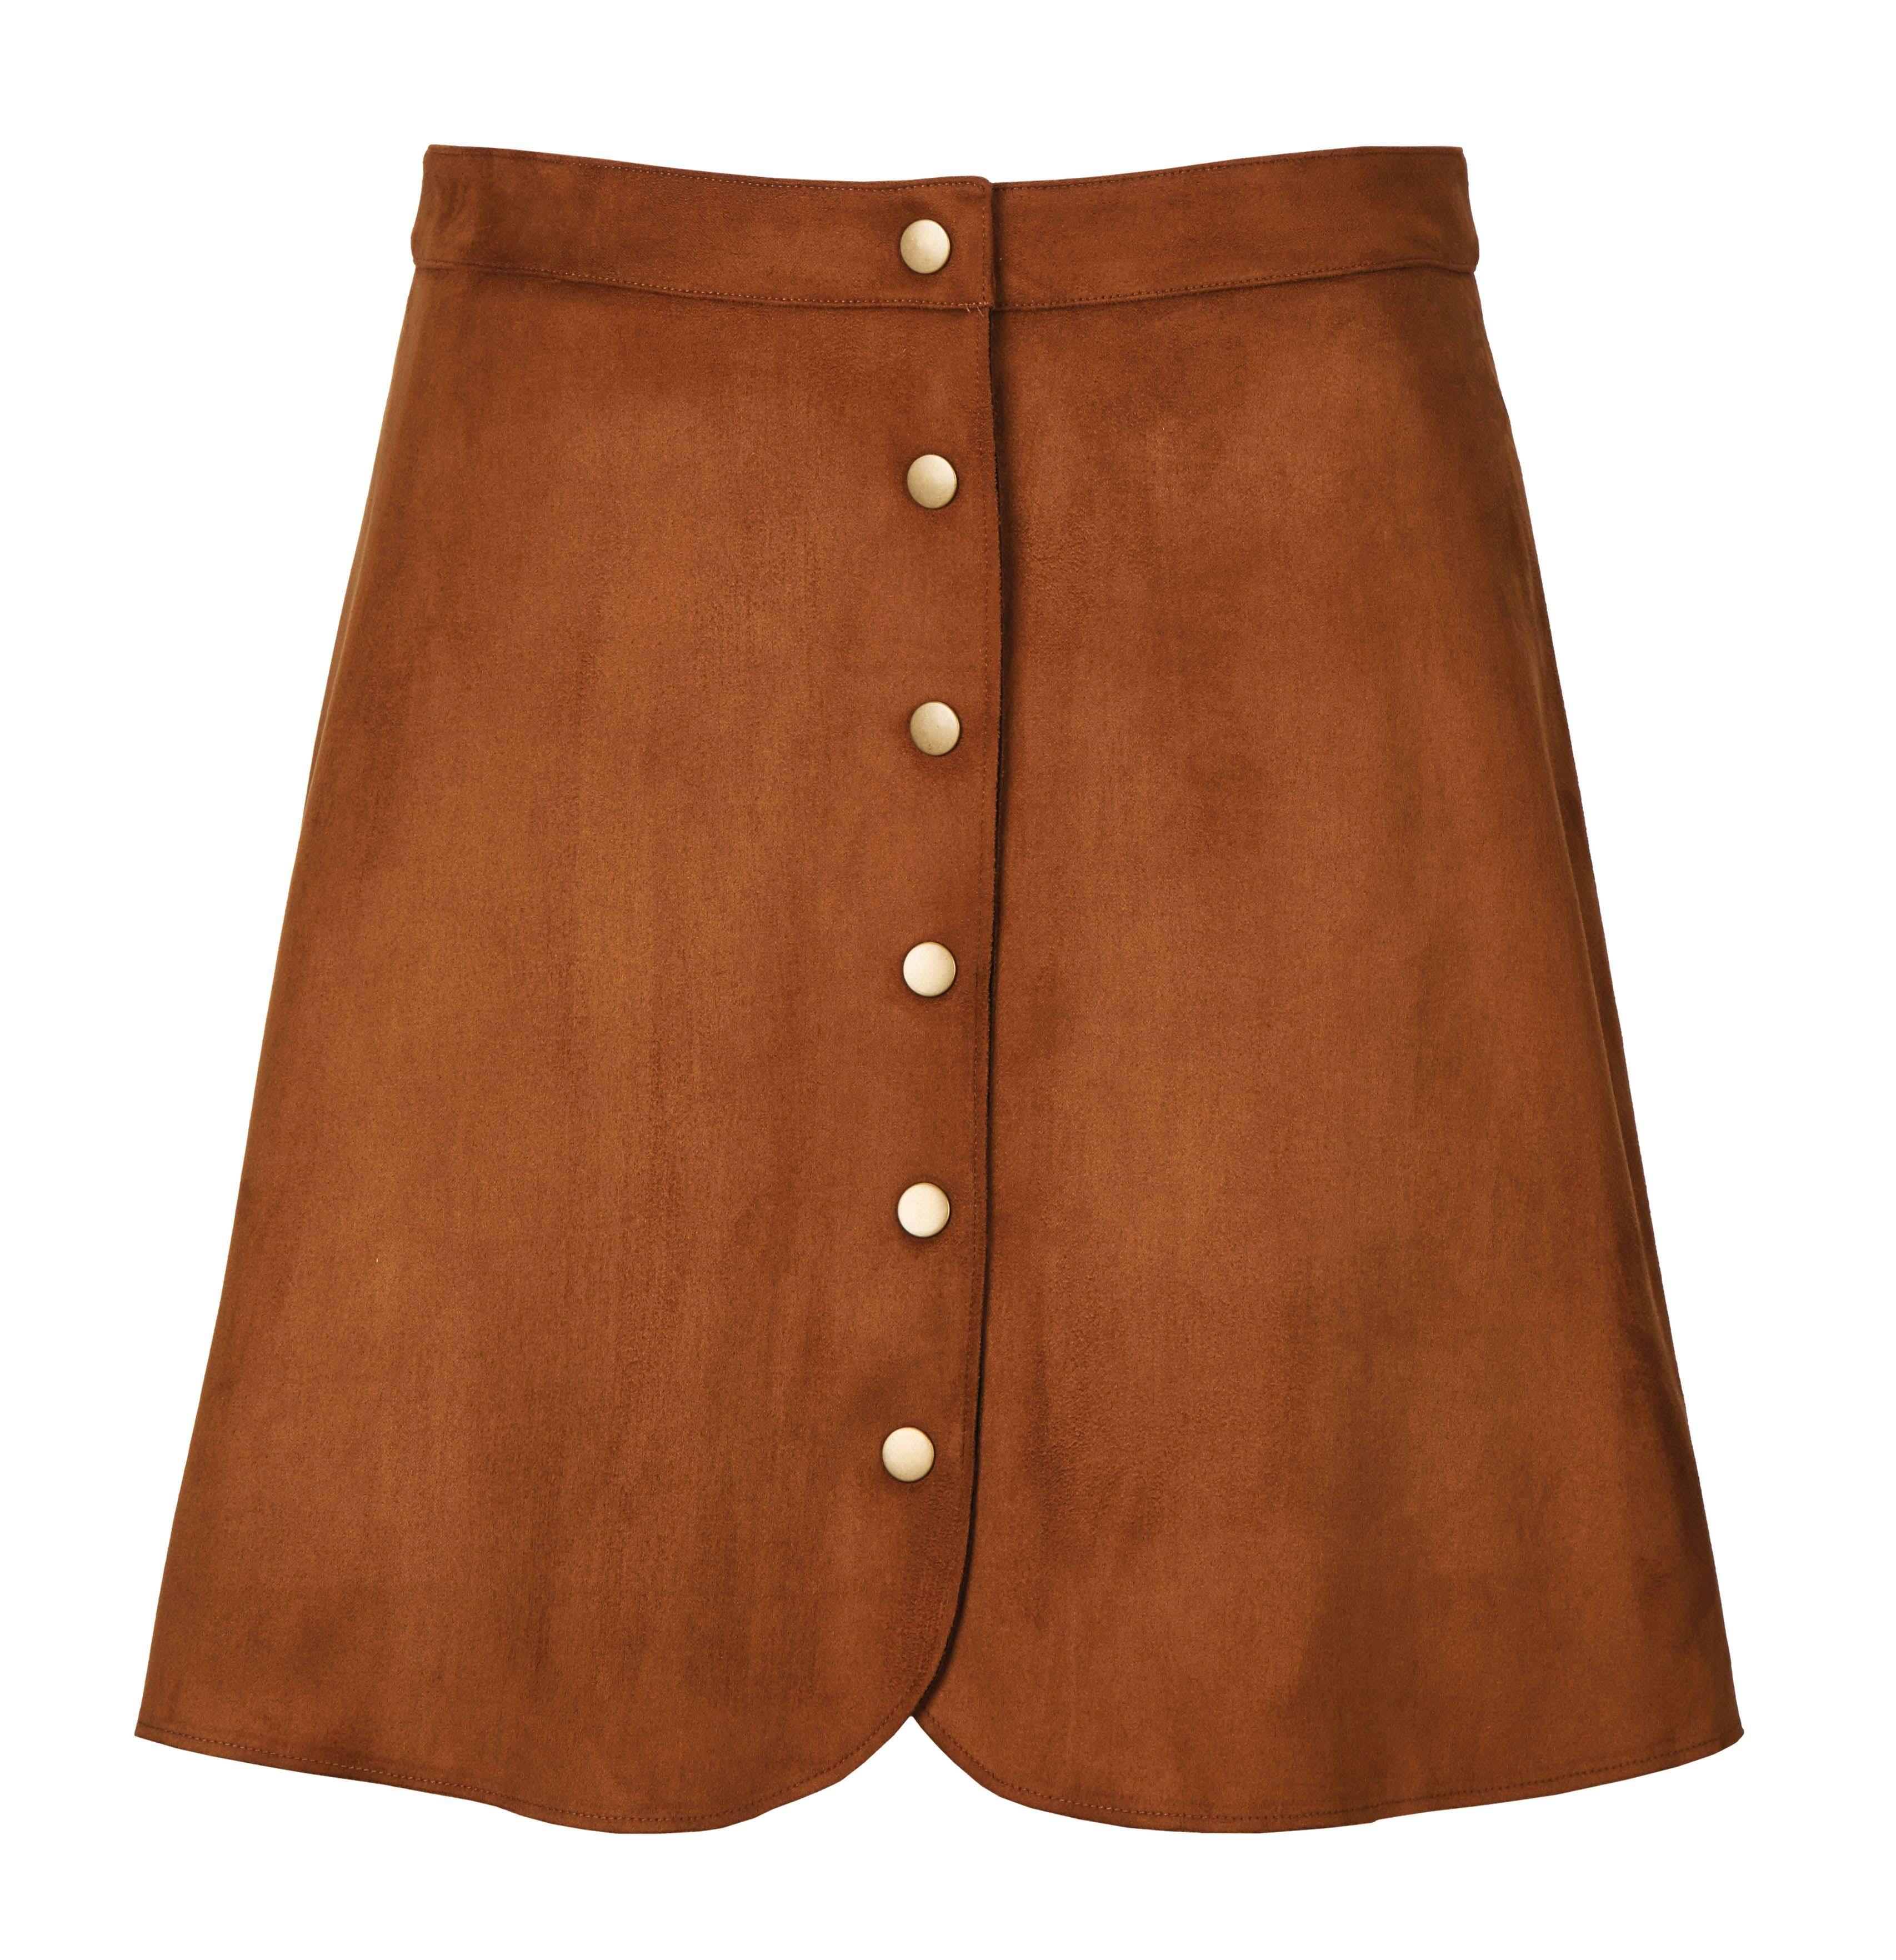 6090897 Stella Motel Skirt $99.99 Instore Feb 29 2016